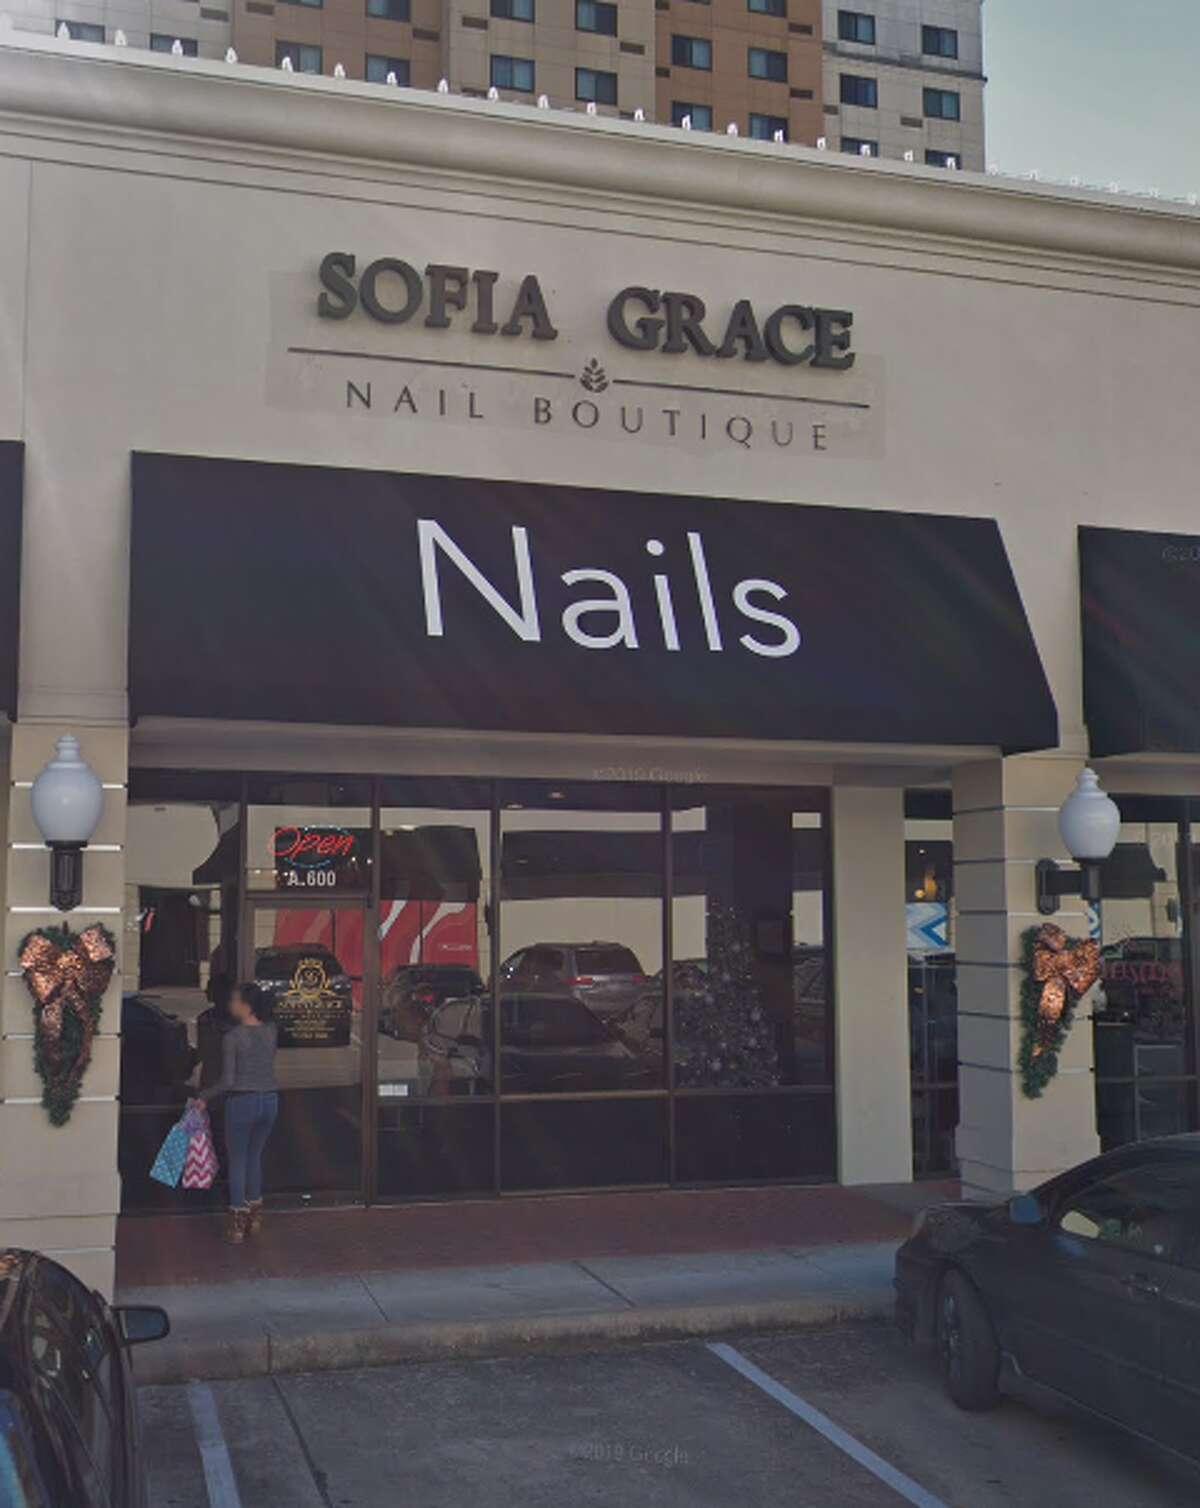 14. Sofia Grace Nail Boutique Address: 2800 Sage Road